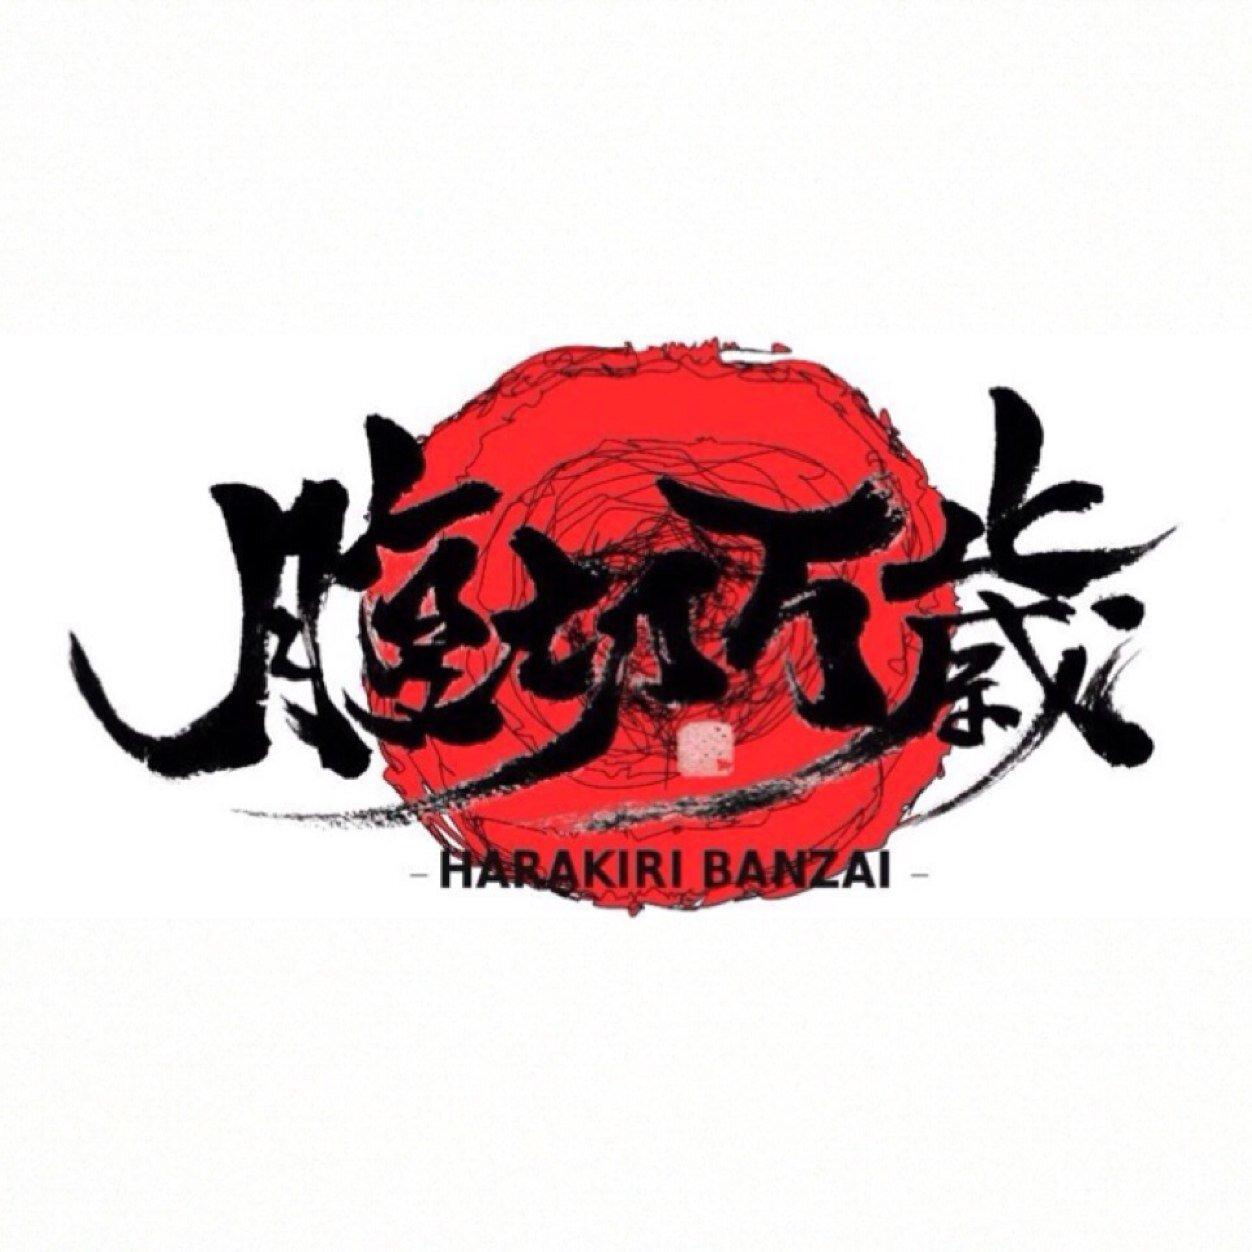 腹切万歳-HARAKIRIBANZAI- (@HAR...